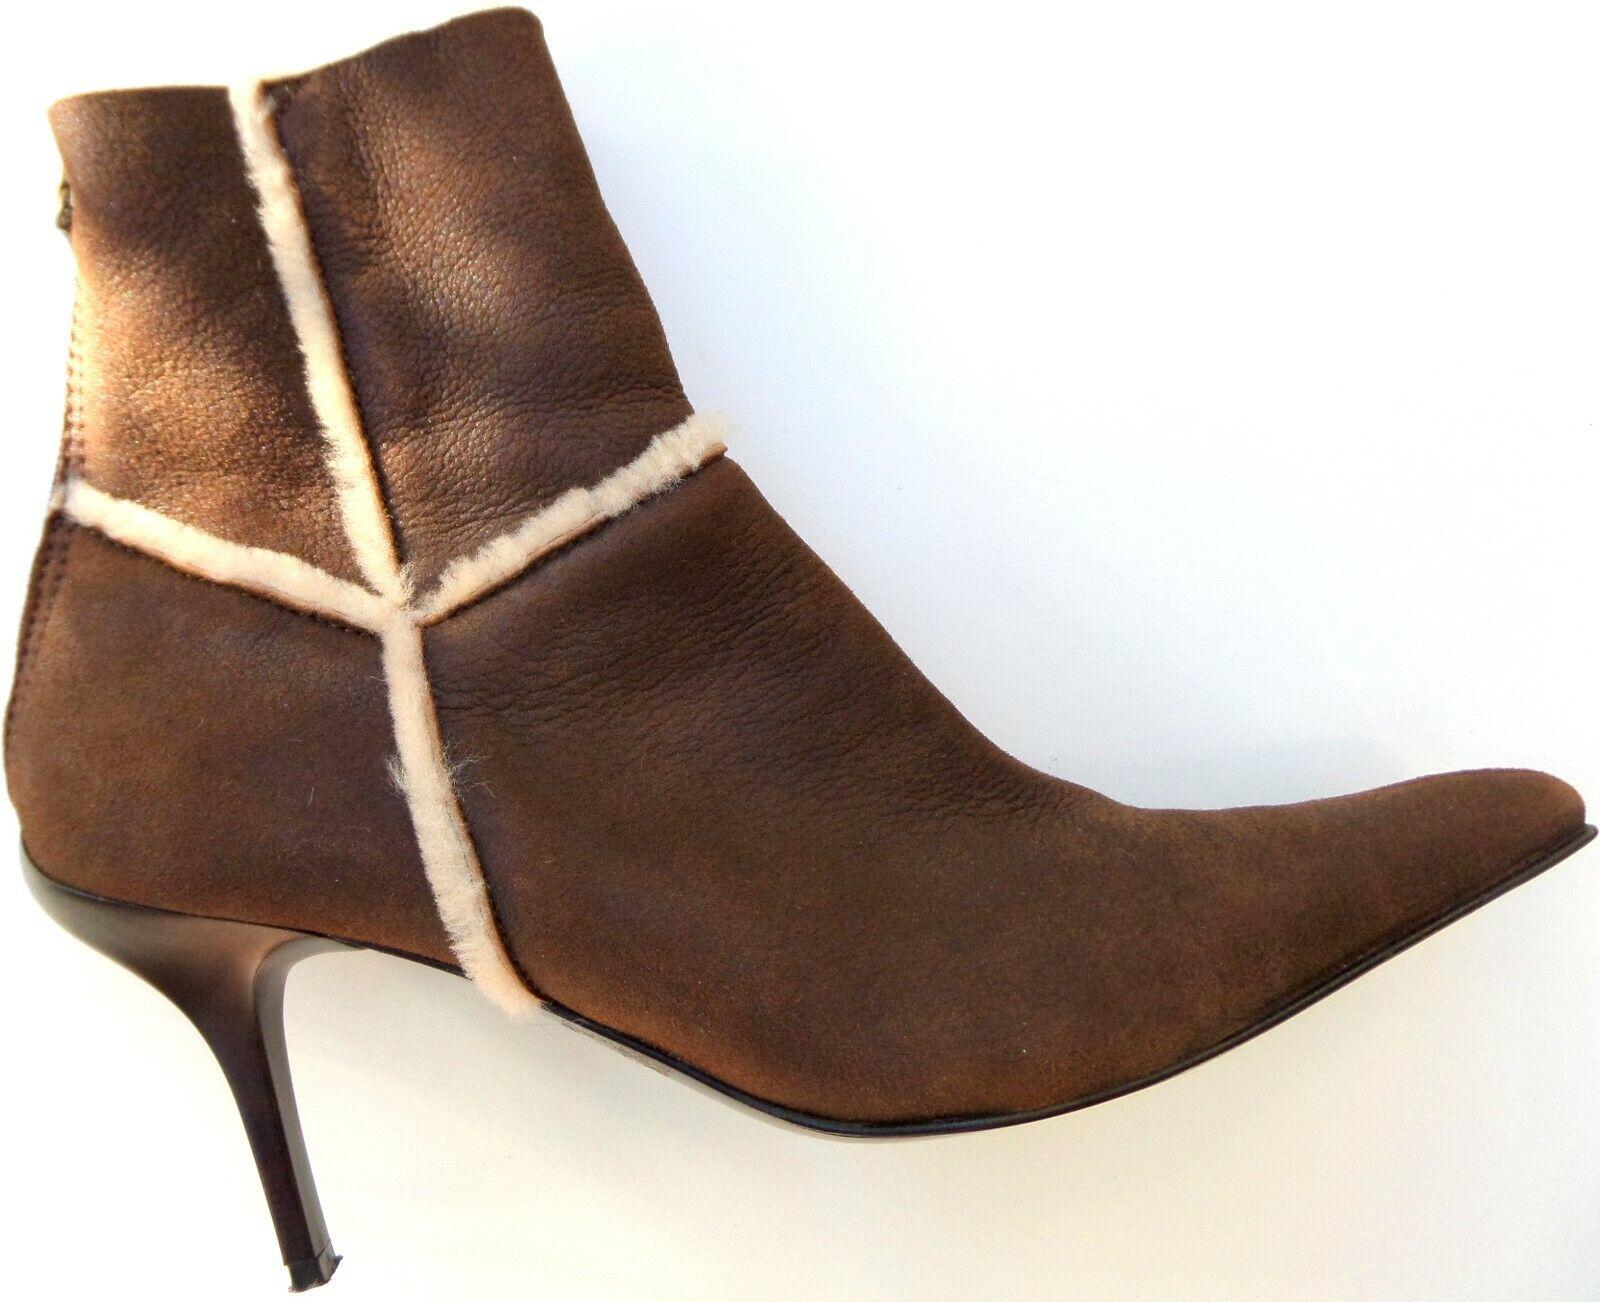 CASADEI Luxus ANKLE Fell Stiefel STIEFELETTE in Gr. U S 11 D 41 e v t l. 41.5